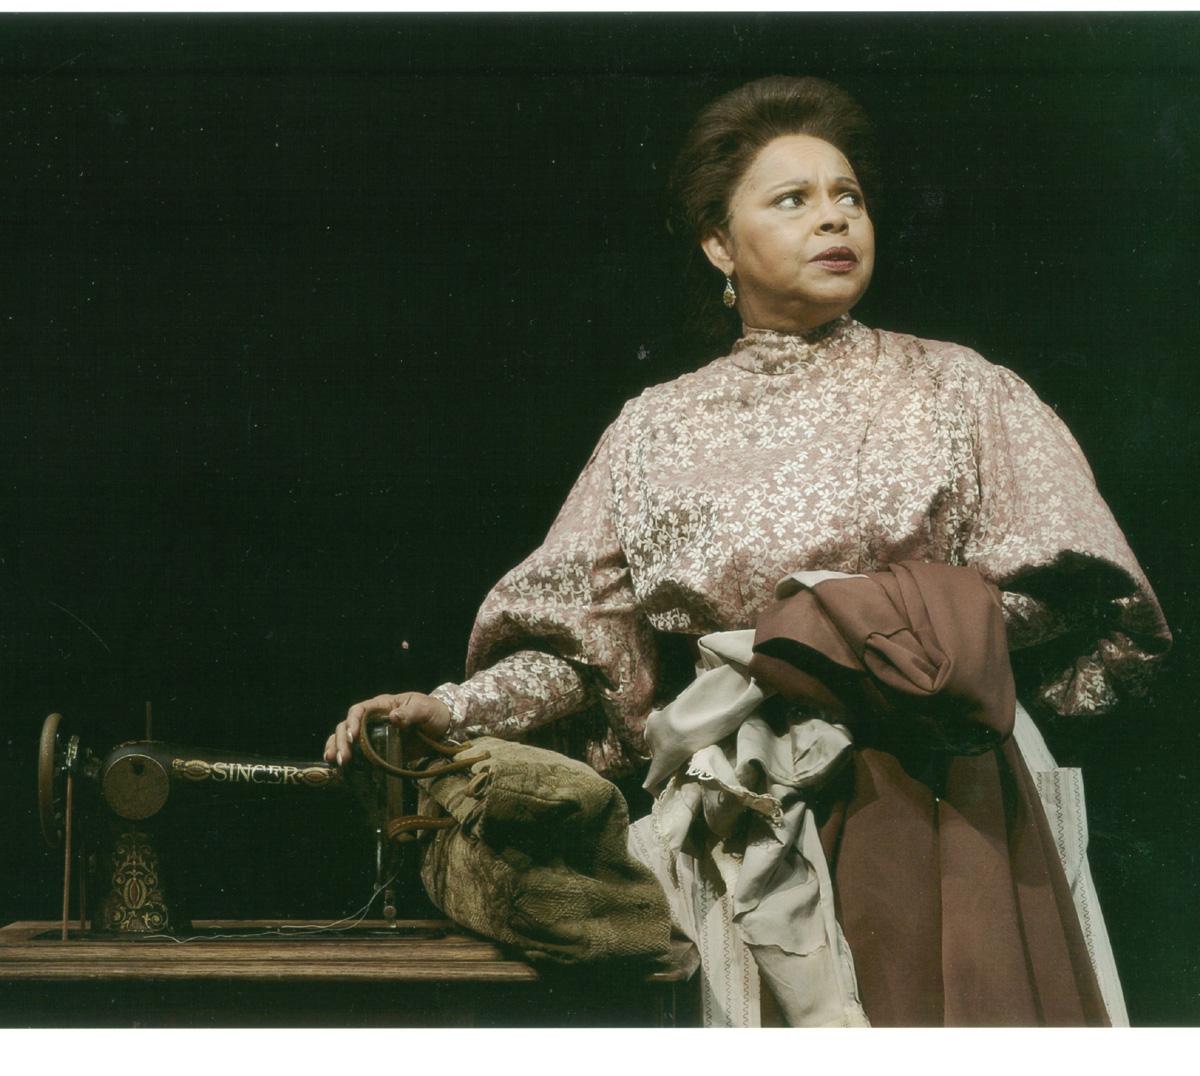 Barbara Ann Teer / Charlie L. Russell - Black Drama